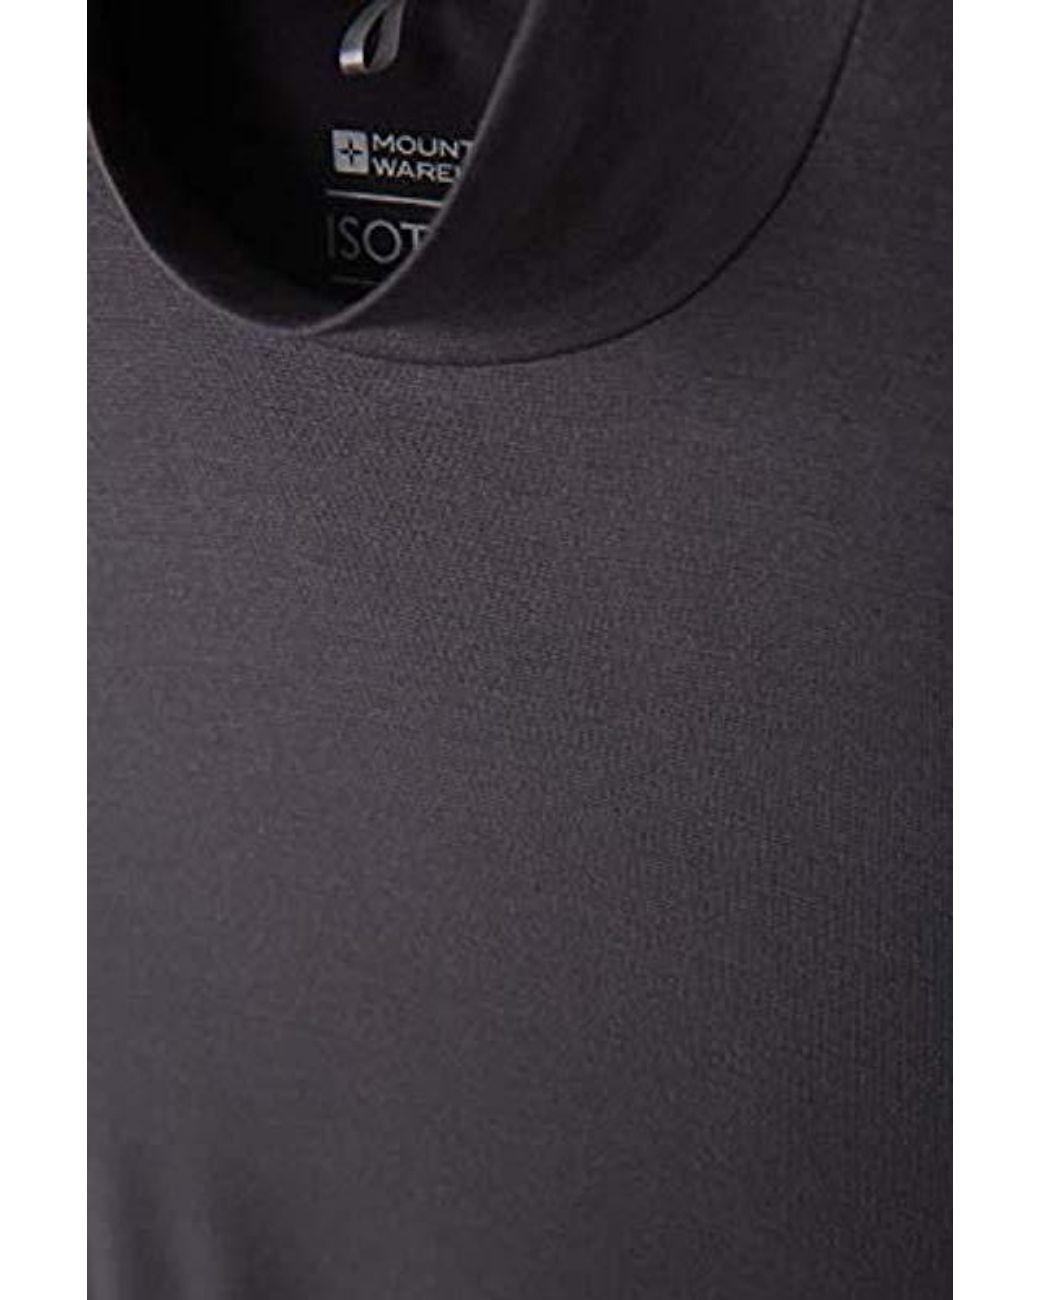 EX Mountain Warehouse Rebecca Long Sleeve Scoop Neck T-shirt